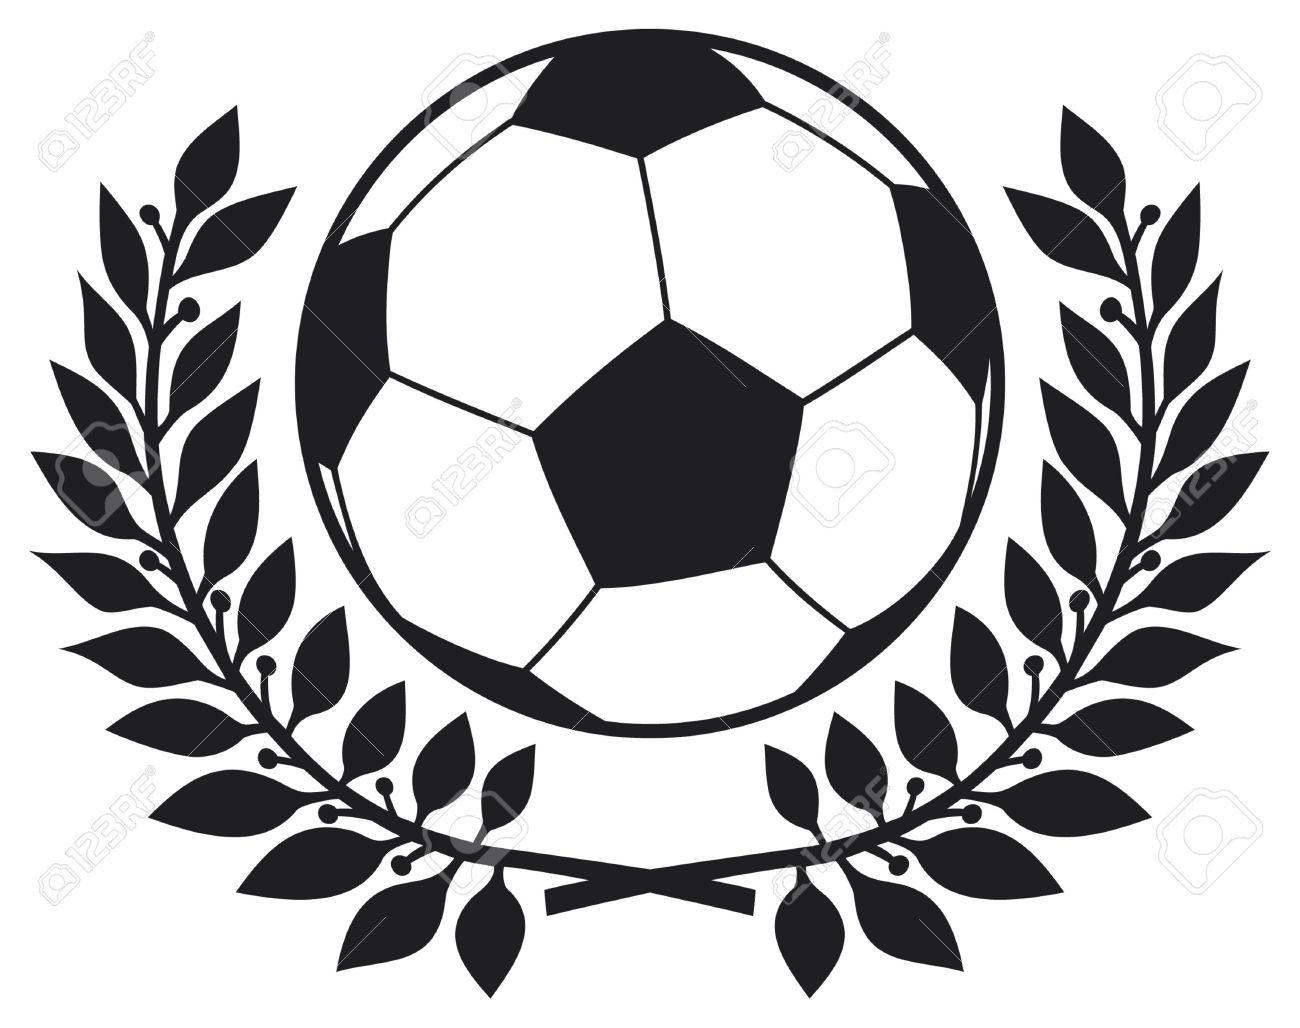 Bola De Futebol E Coroa De Louros Futebol Clube Símbolo, Símbolo